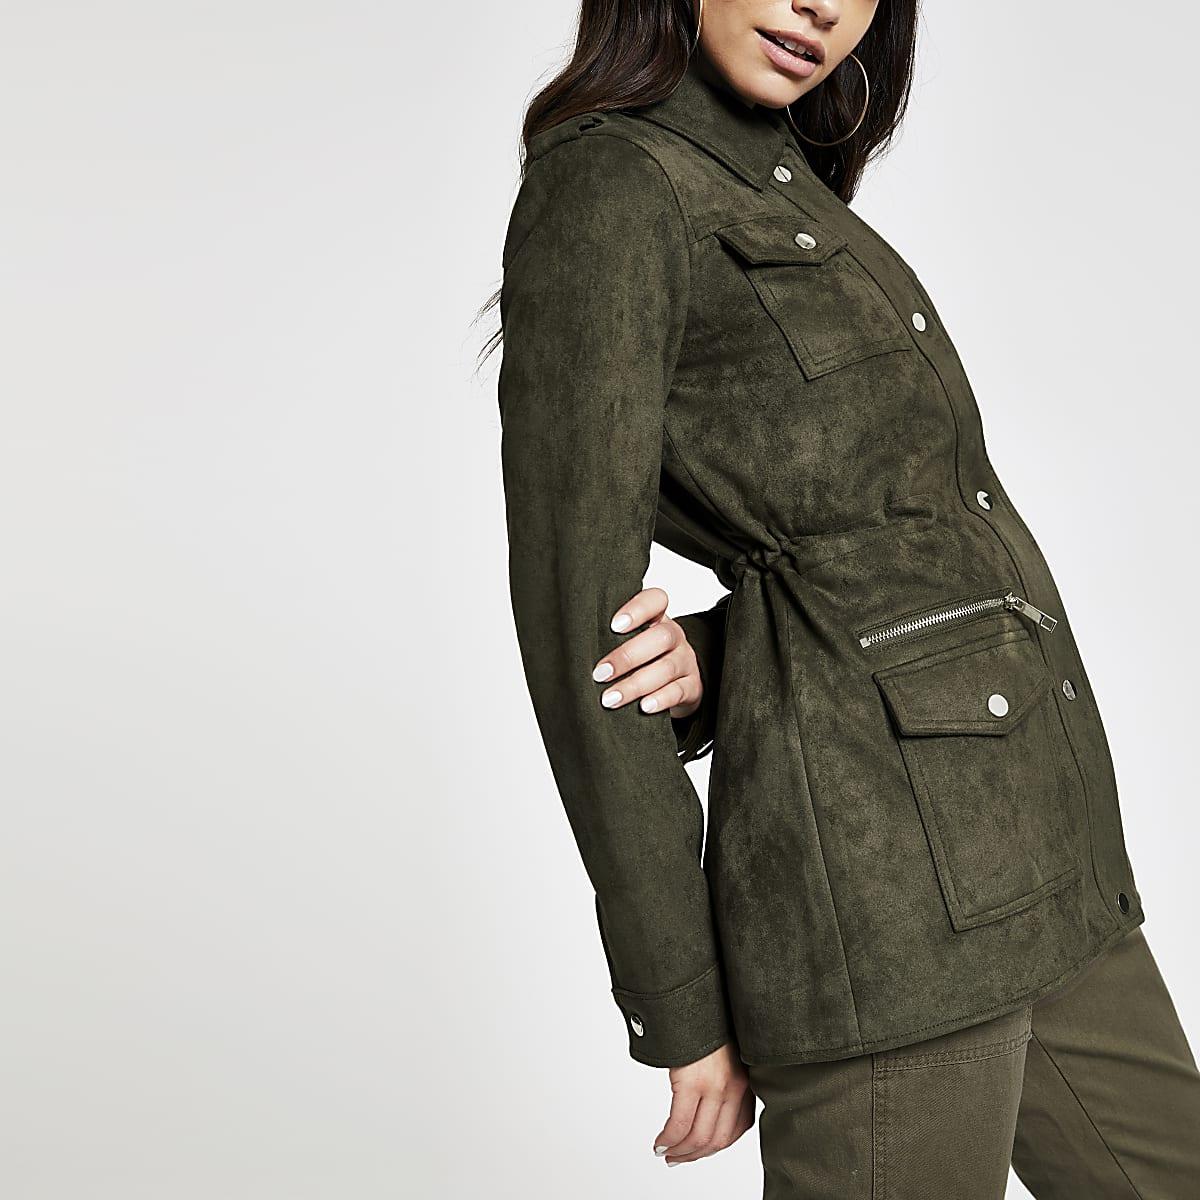 Khaki faux suede army jacket